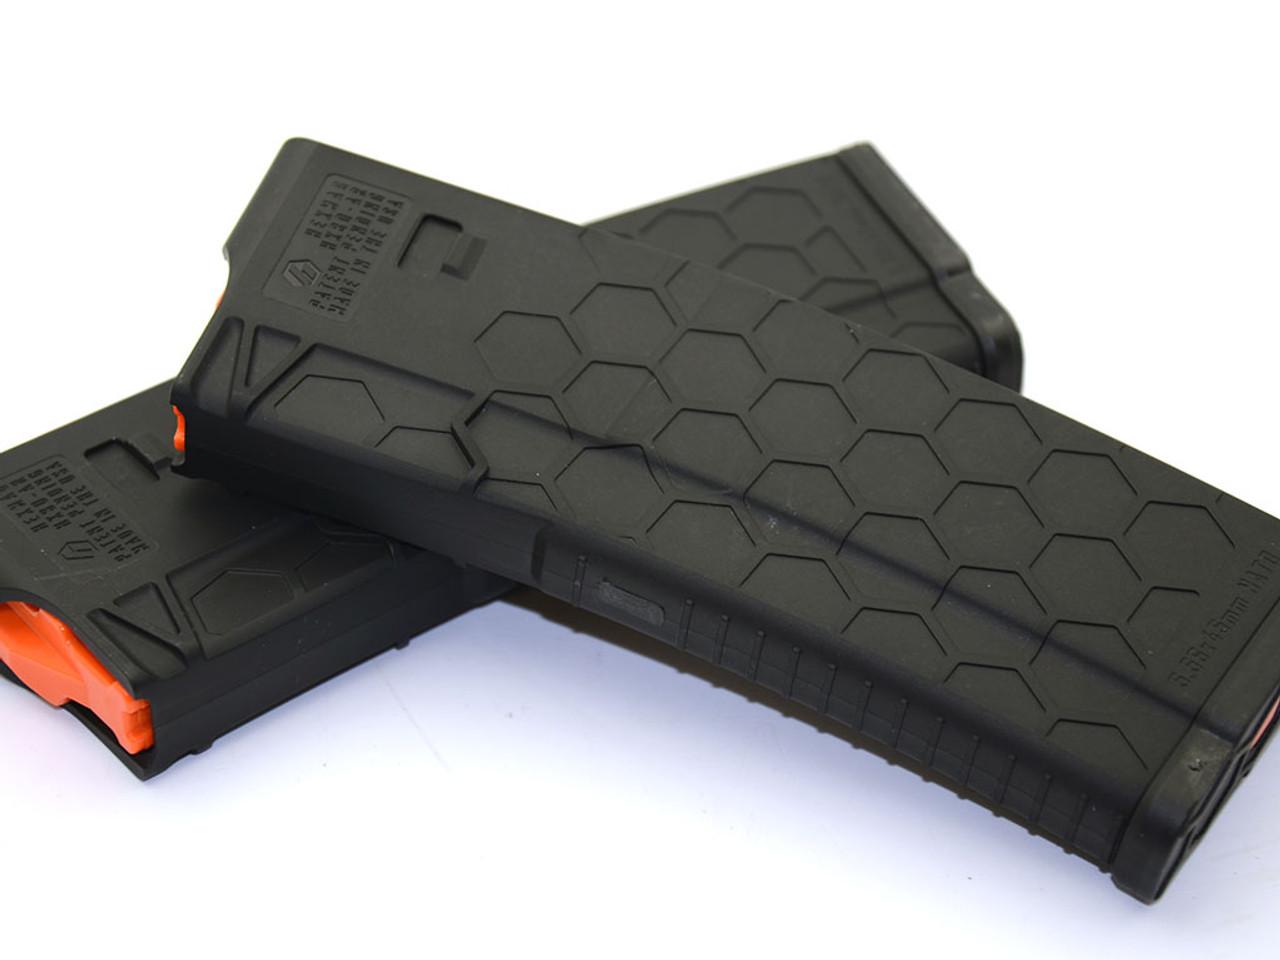 Hexmag - HX30 AR-15 Magazine